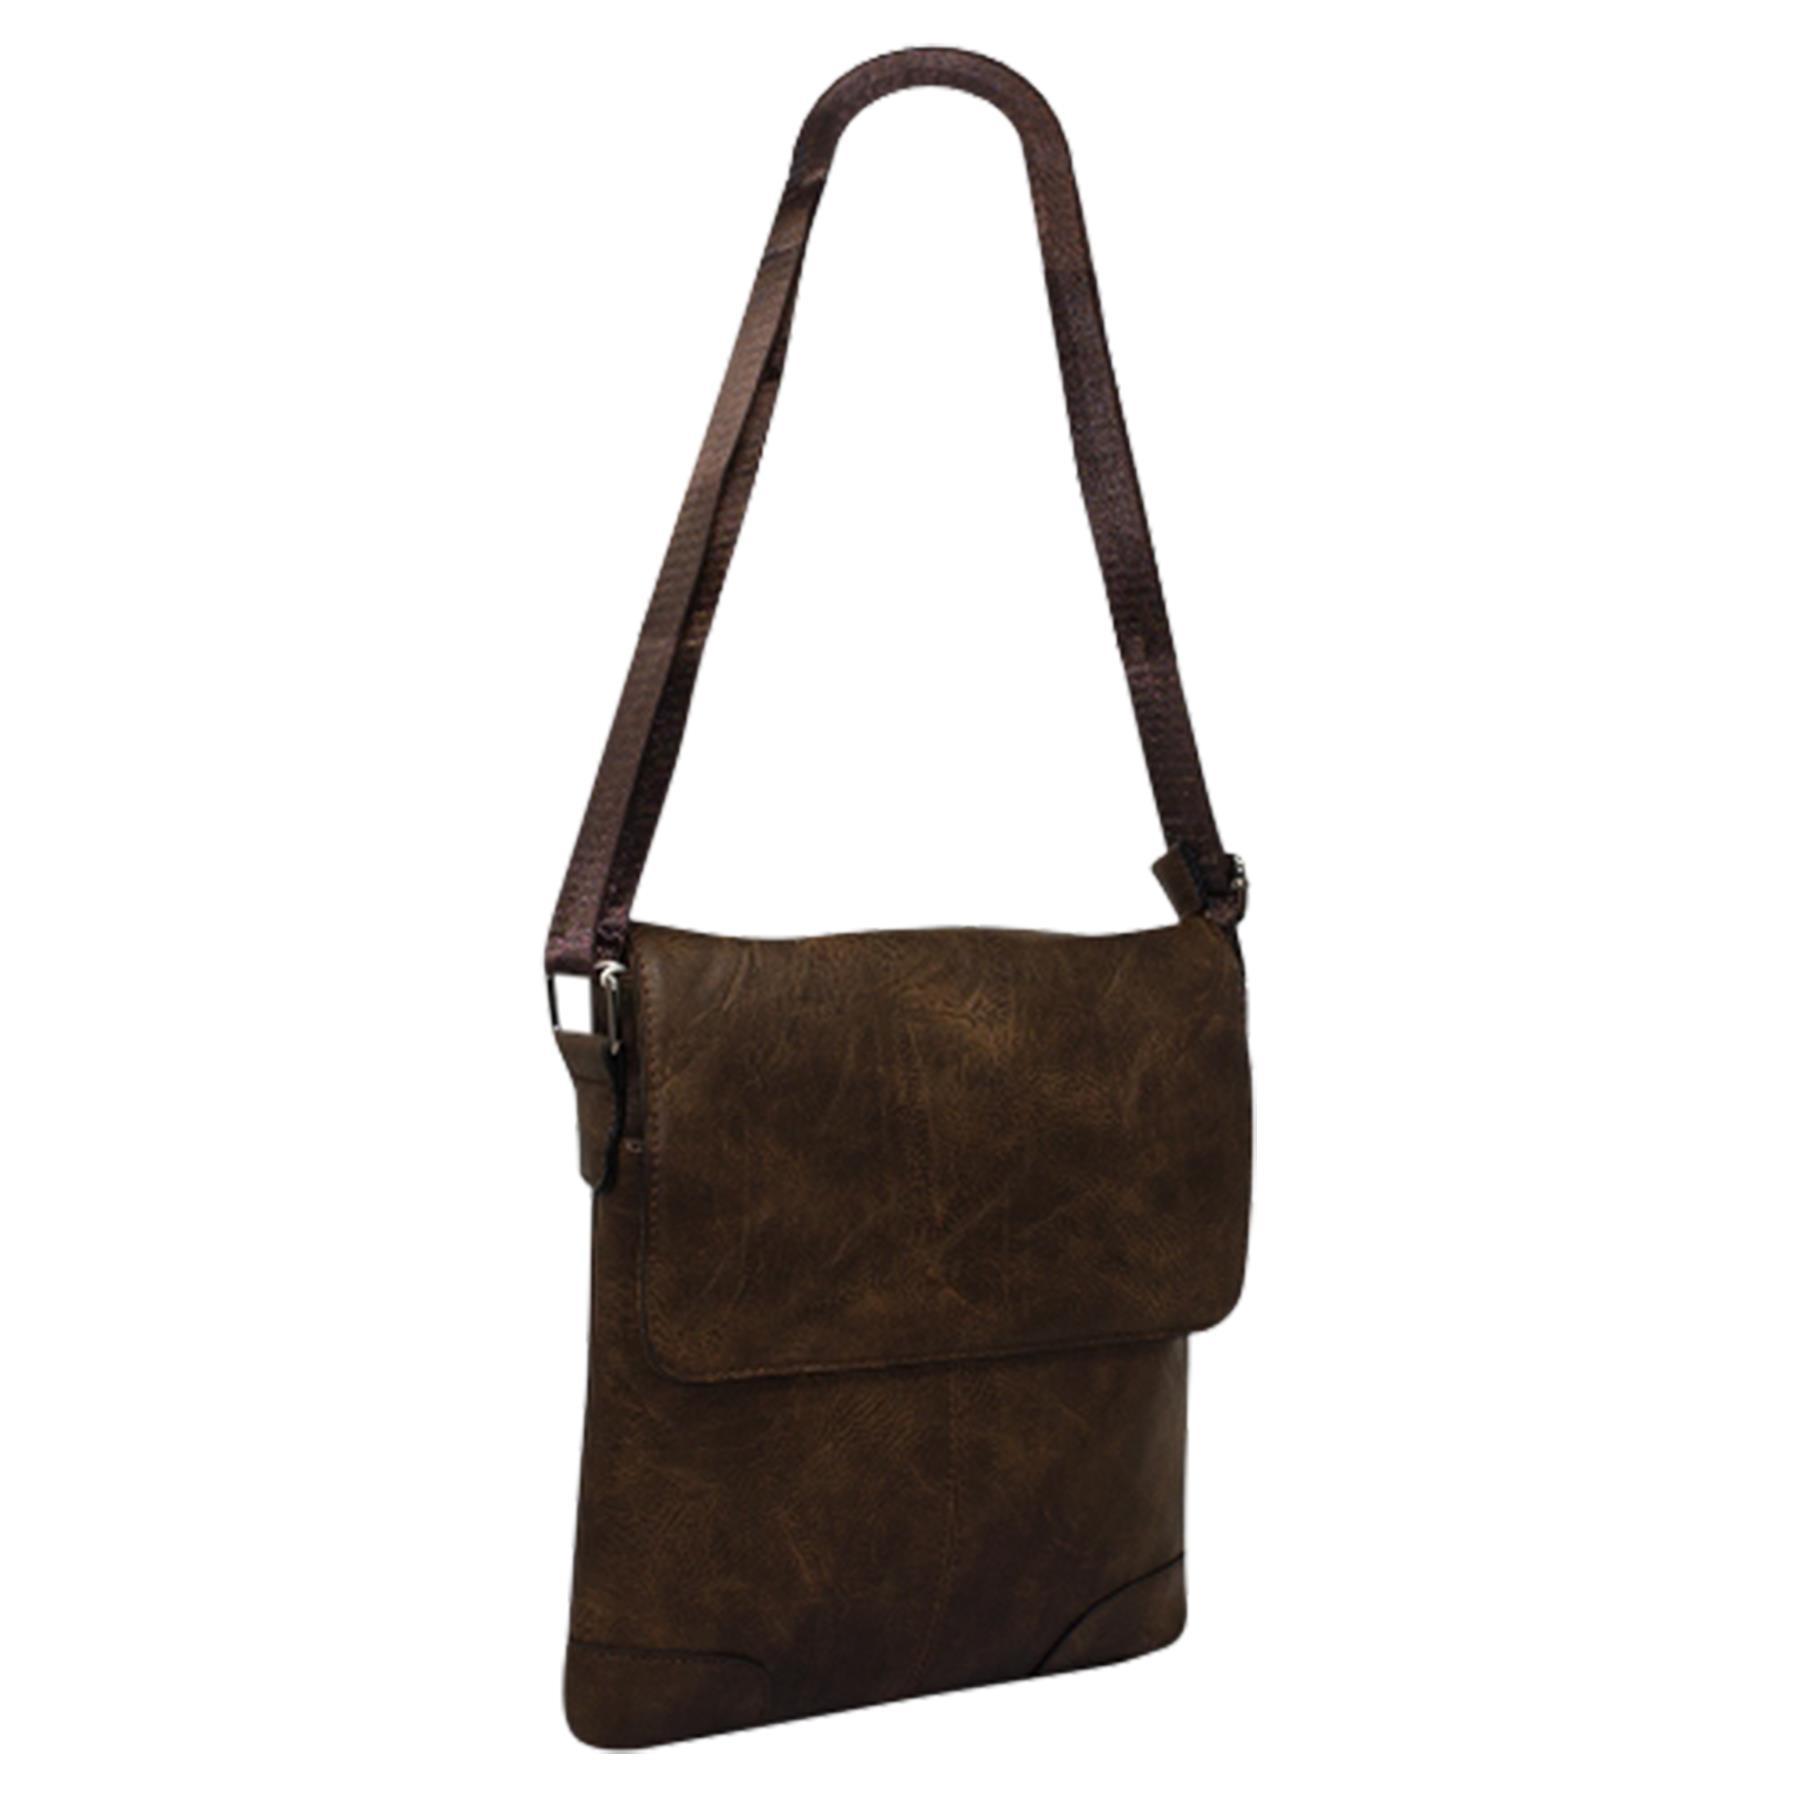 New-Plain-Faux-Leather-Men-s-Travel-Casual-Flap-Over-Messenger-Bag thumbnail 11